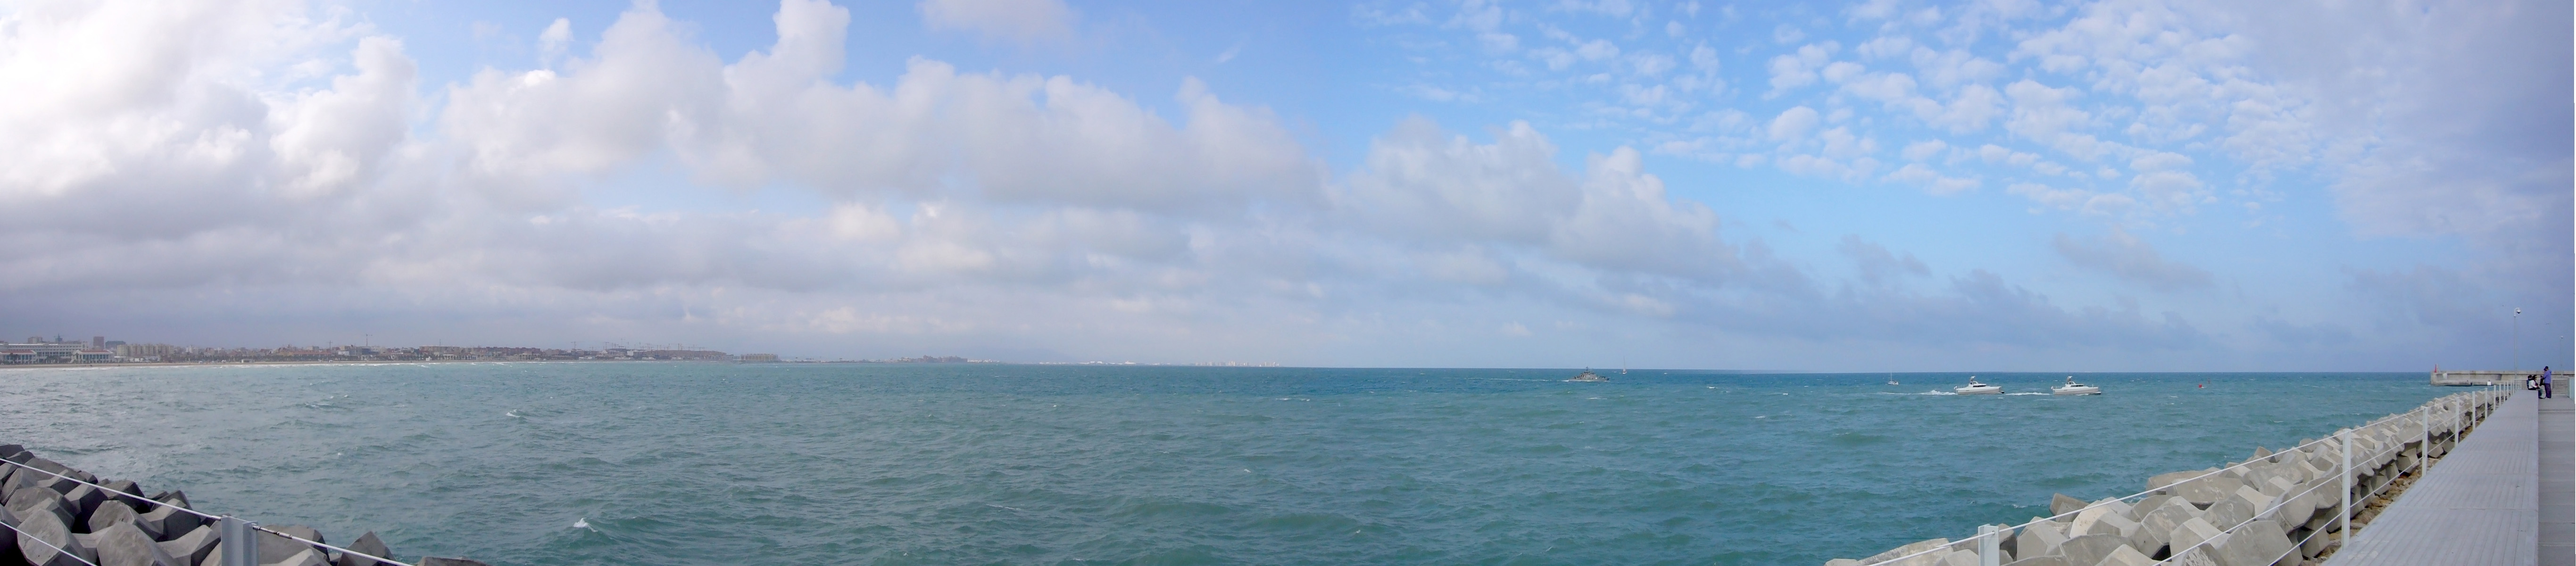 Foto playa Las Arenas. Puerto Valencia Panoramica